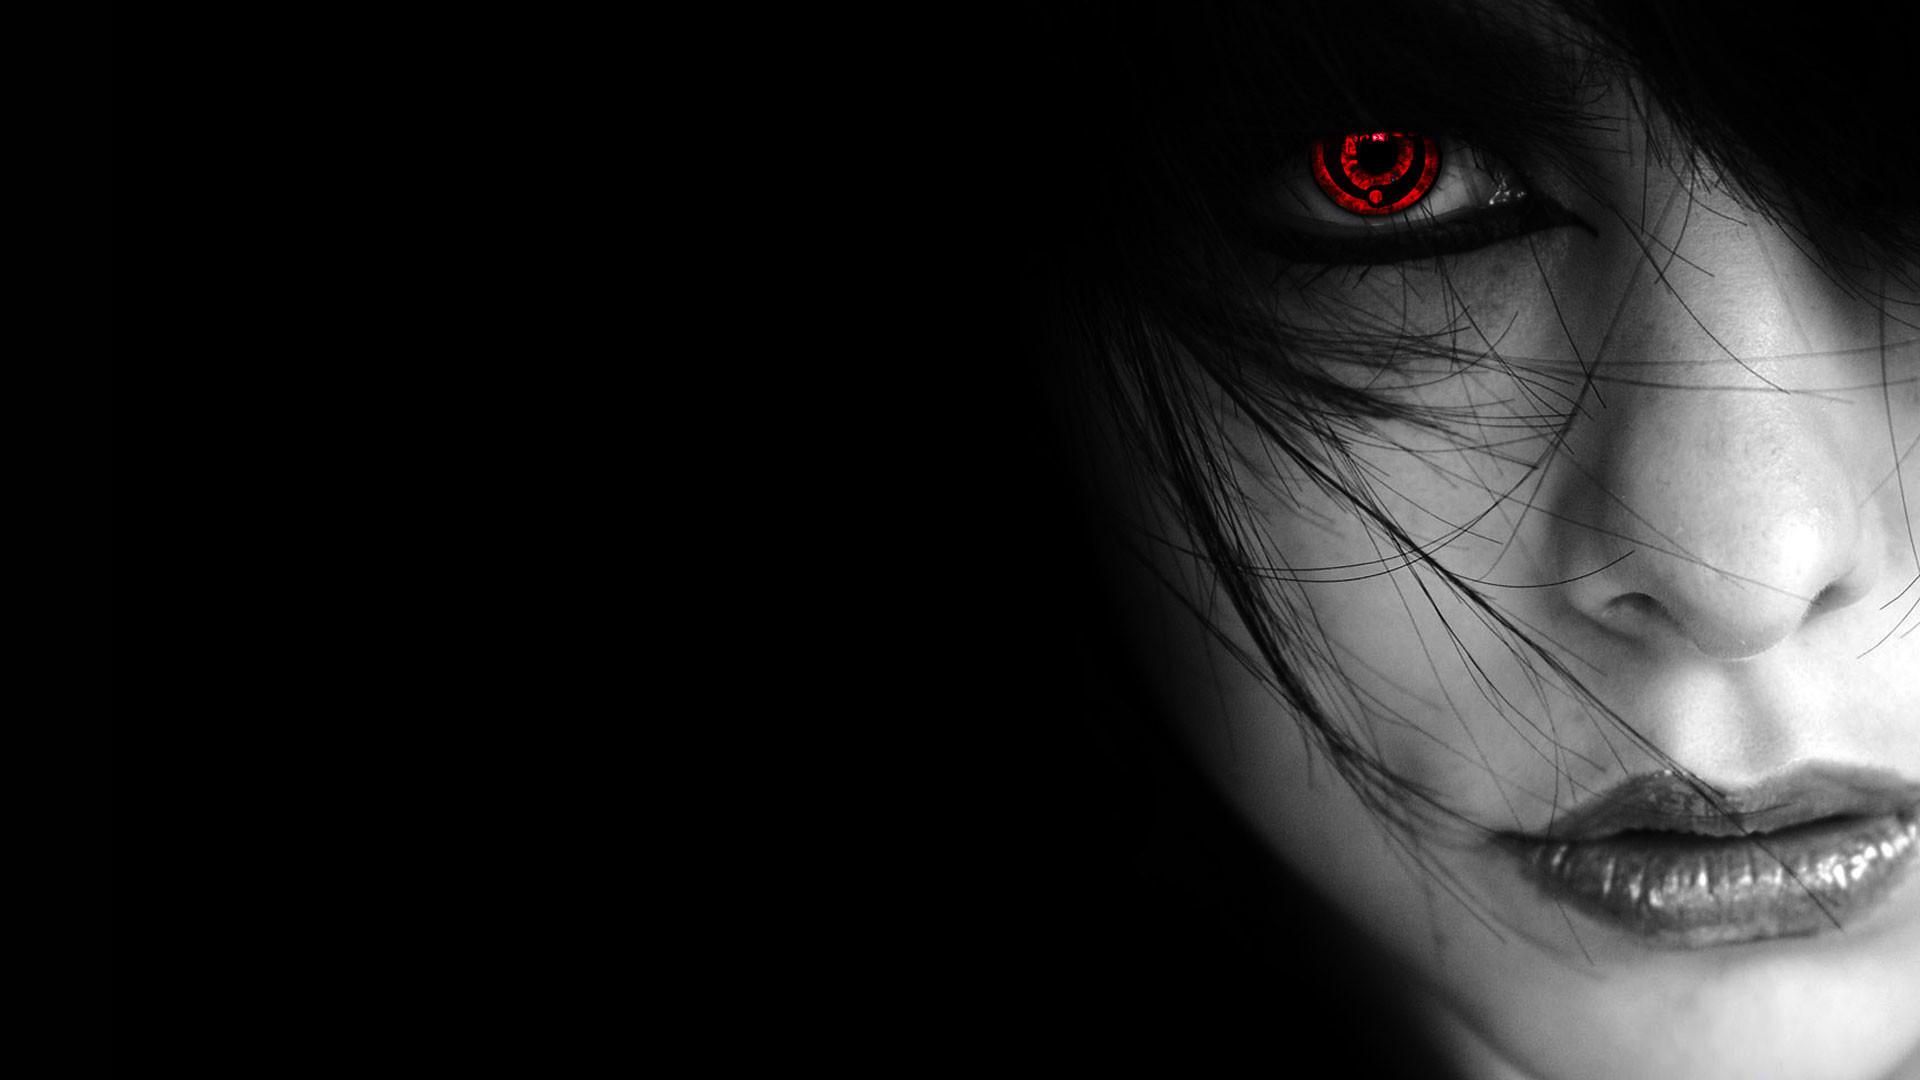 red eye wallpaper 62 images